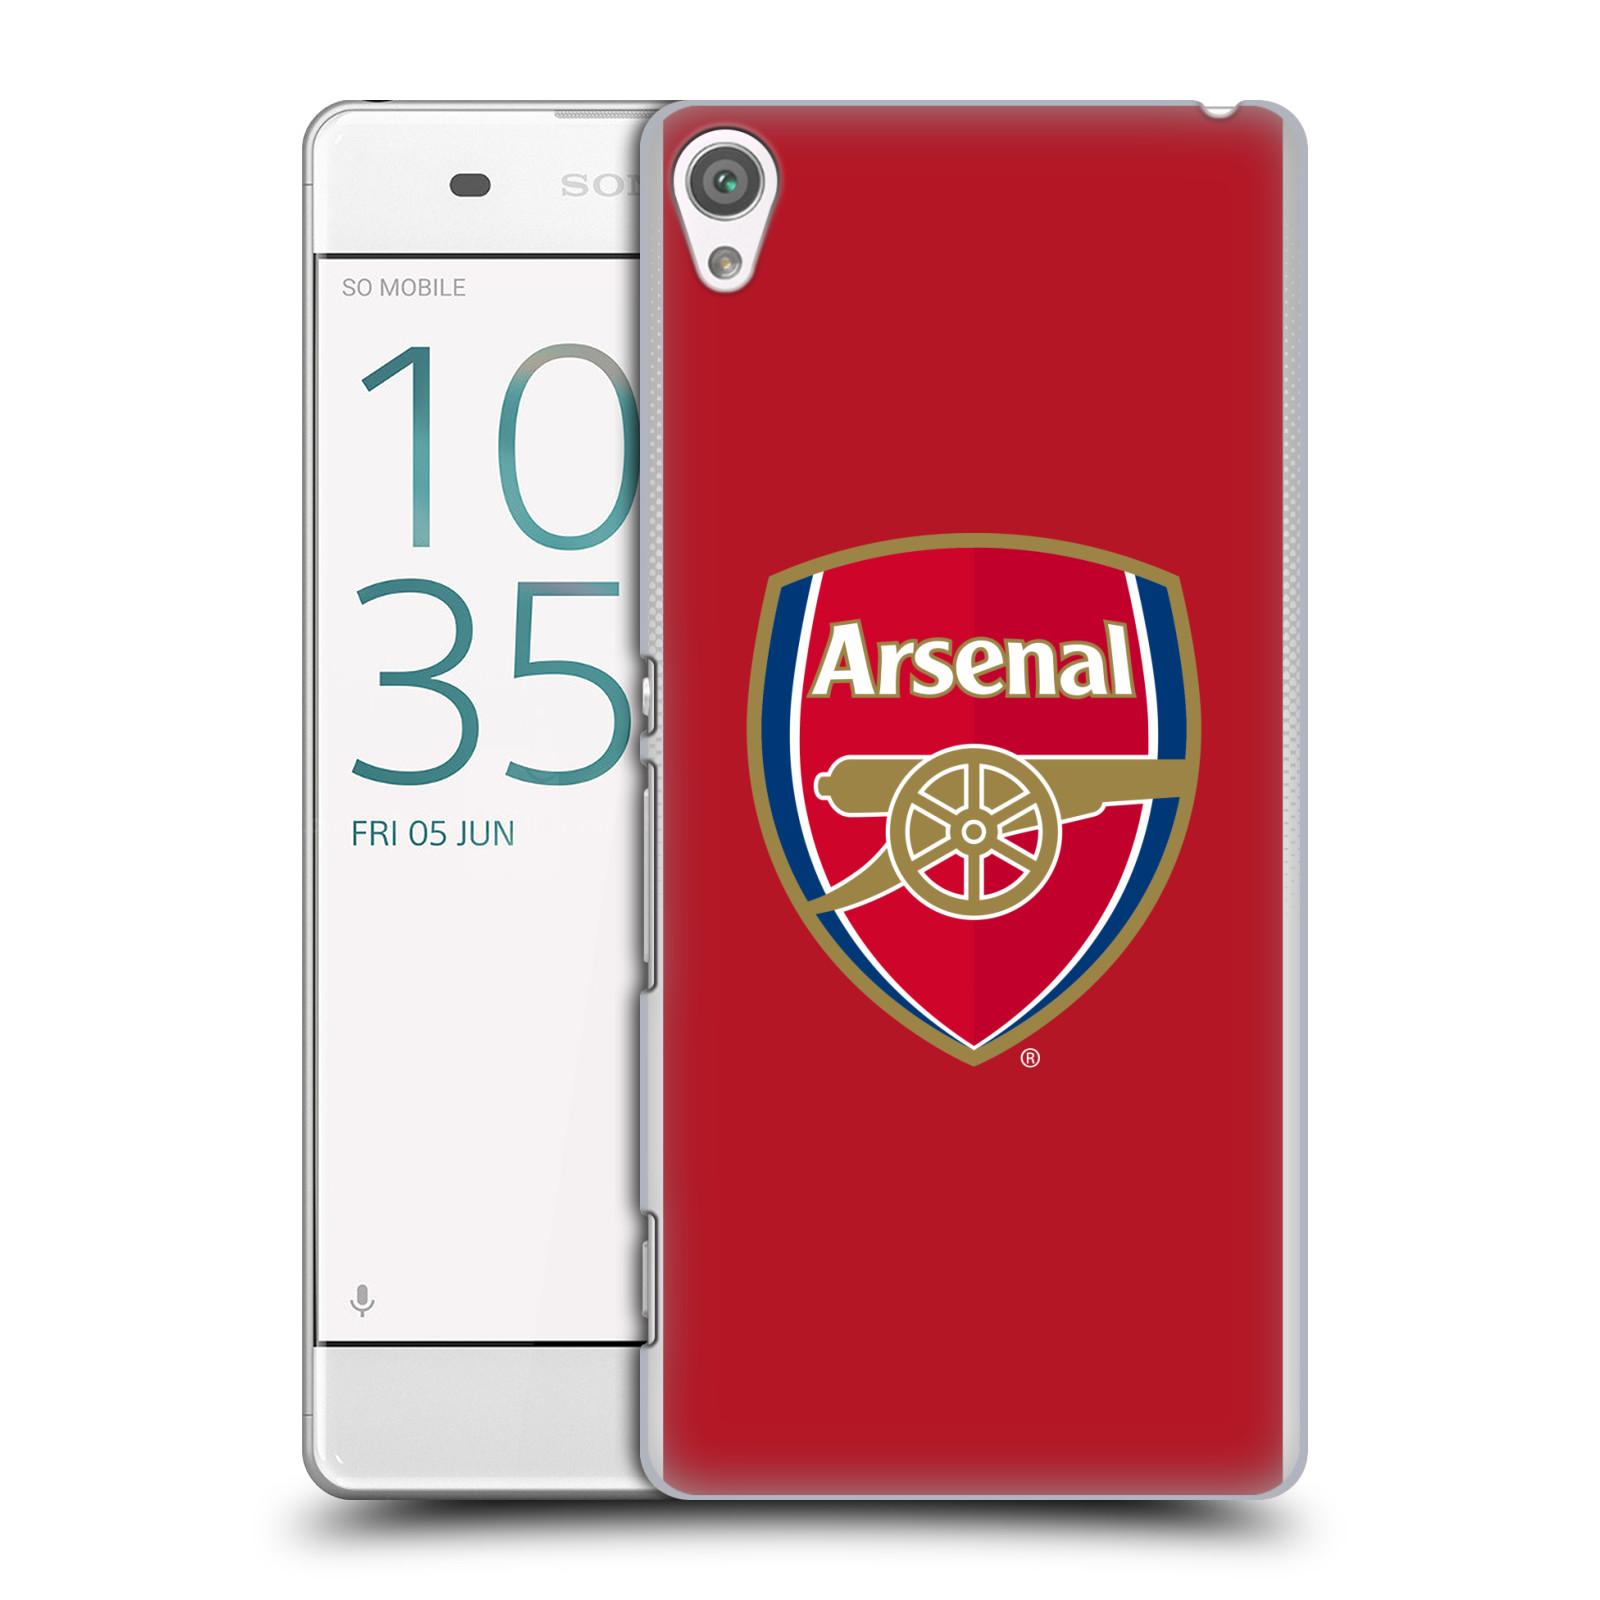 Plastové pouzdro na mobil Sony Xperia XA - Head Case - Arsenal FC - Logo klubu